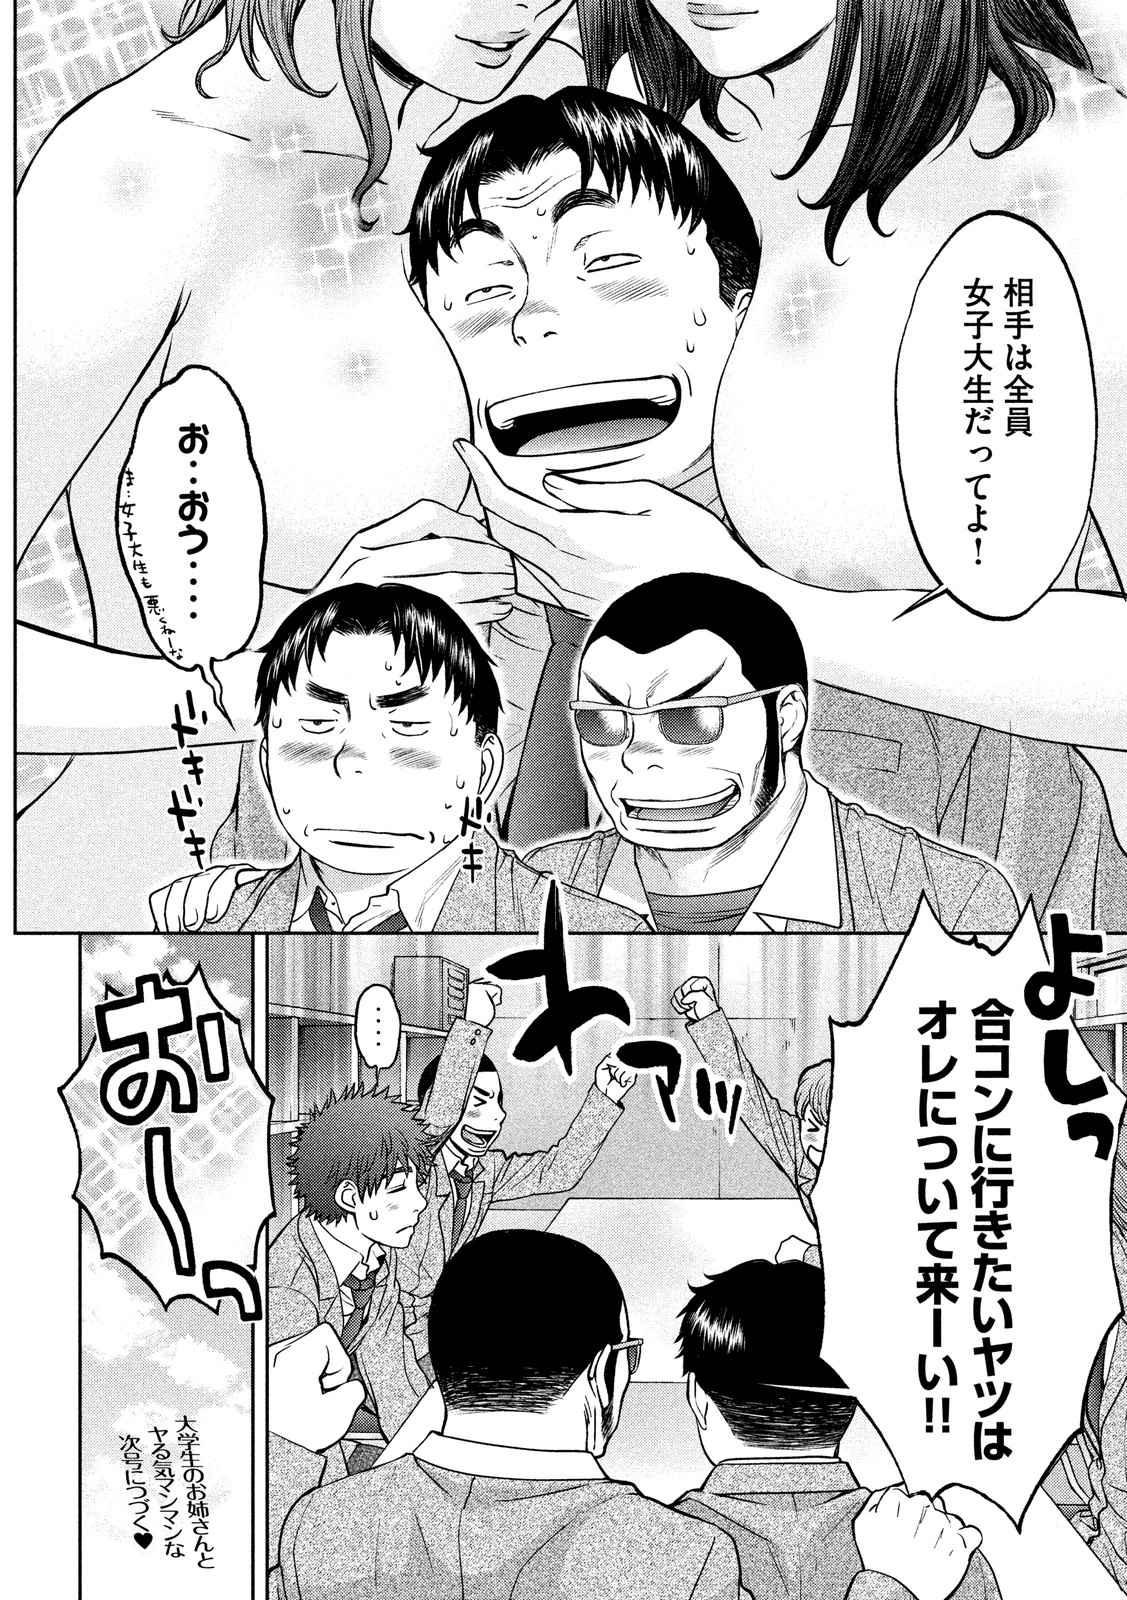 Hantsu_x_Trash Chapter 120 Page 16